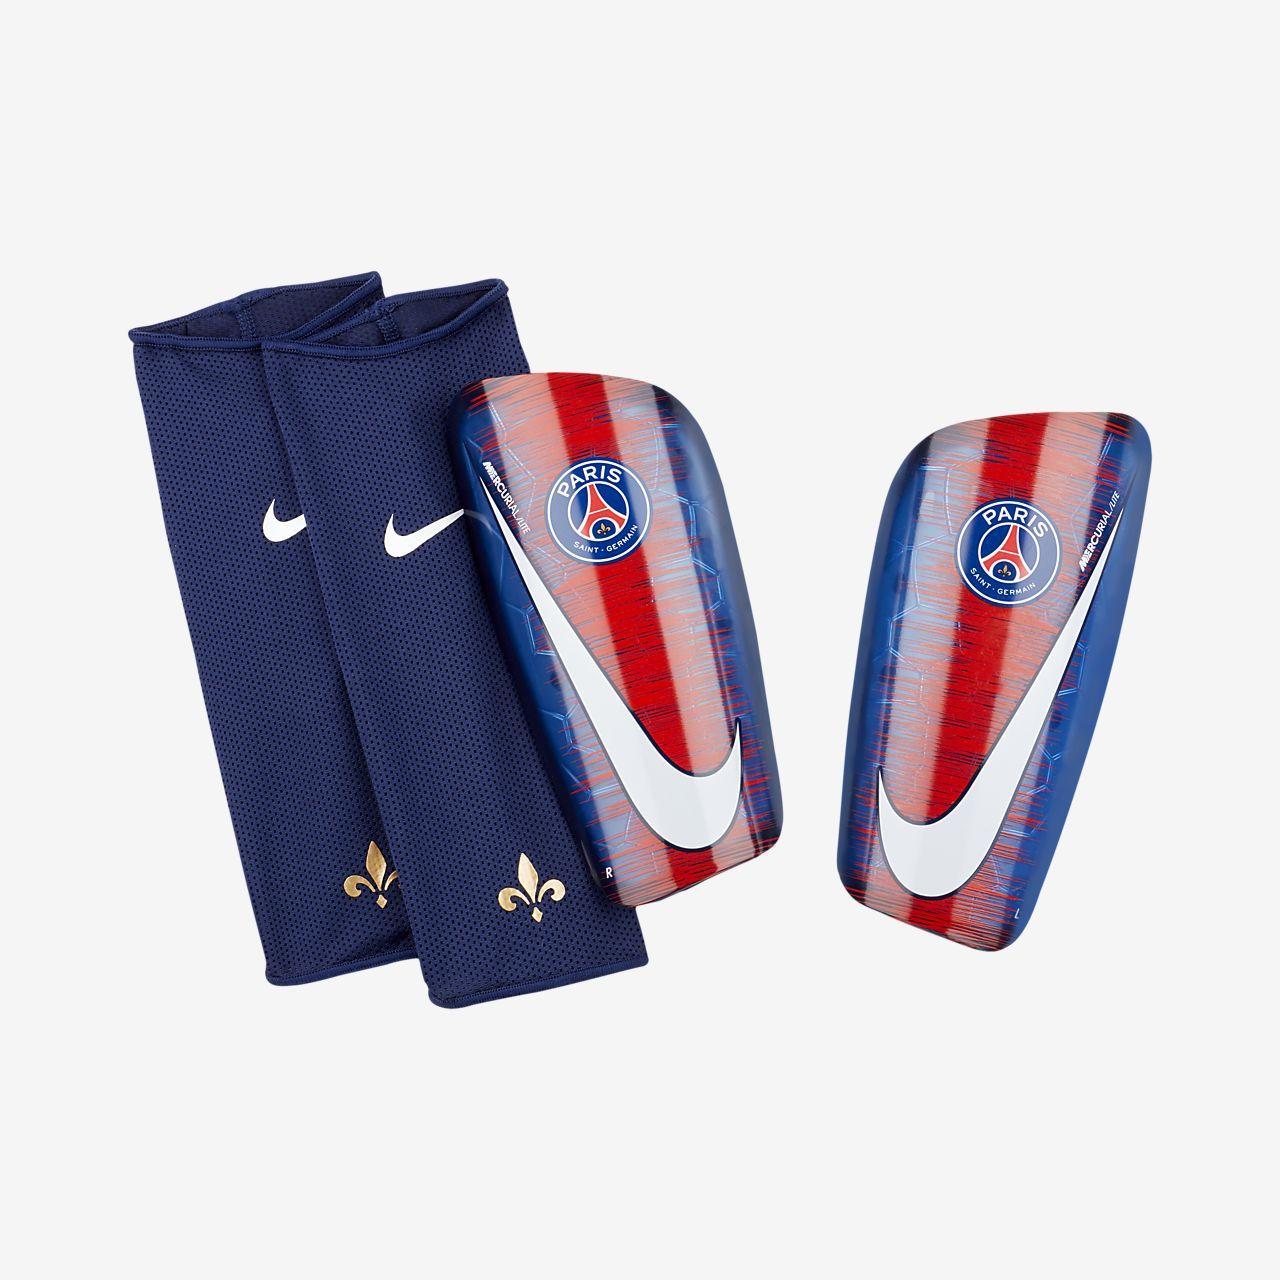 3bbab9fcecb Protège-tibias de football Paris Saint-Germain Mercurial Lite. Nike ...